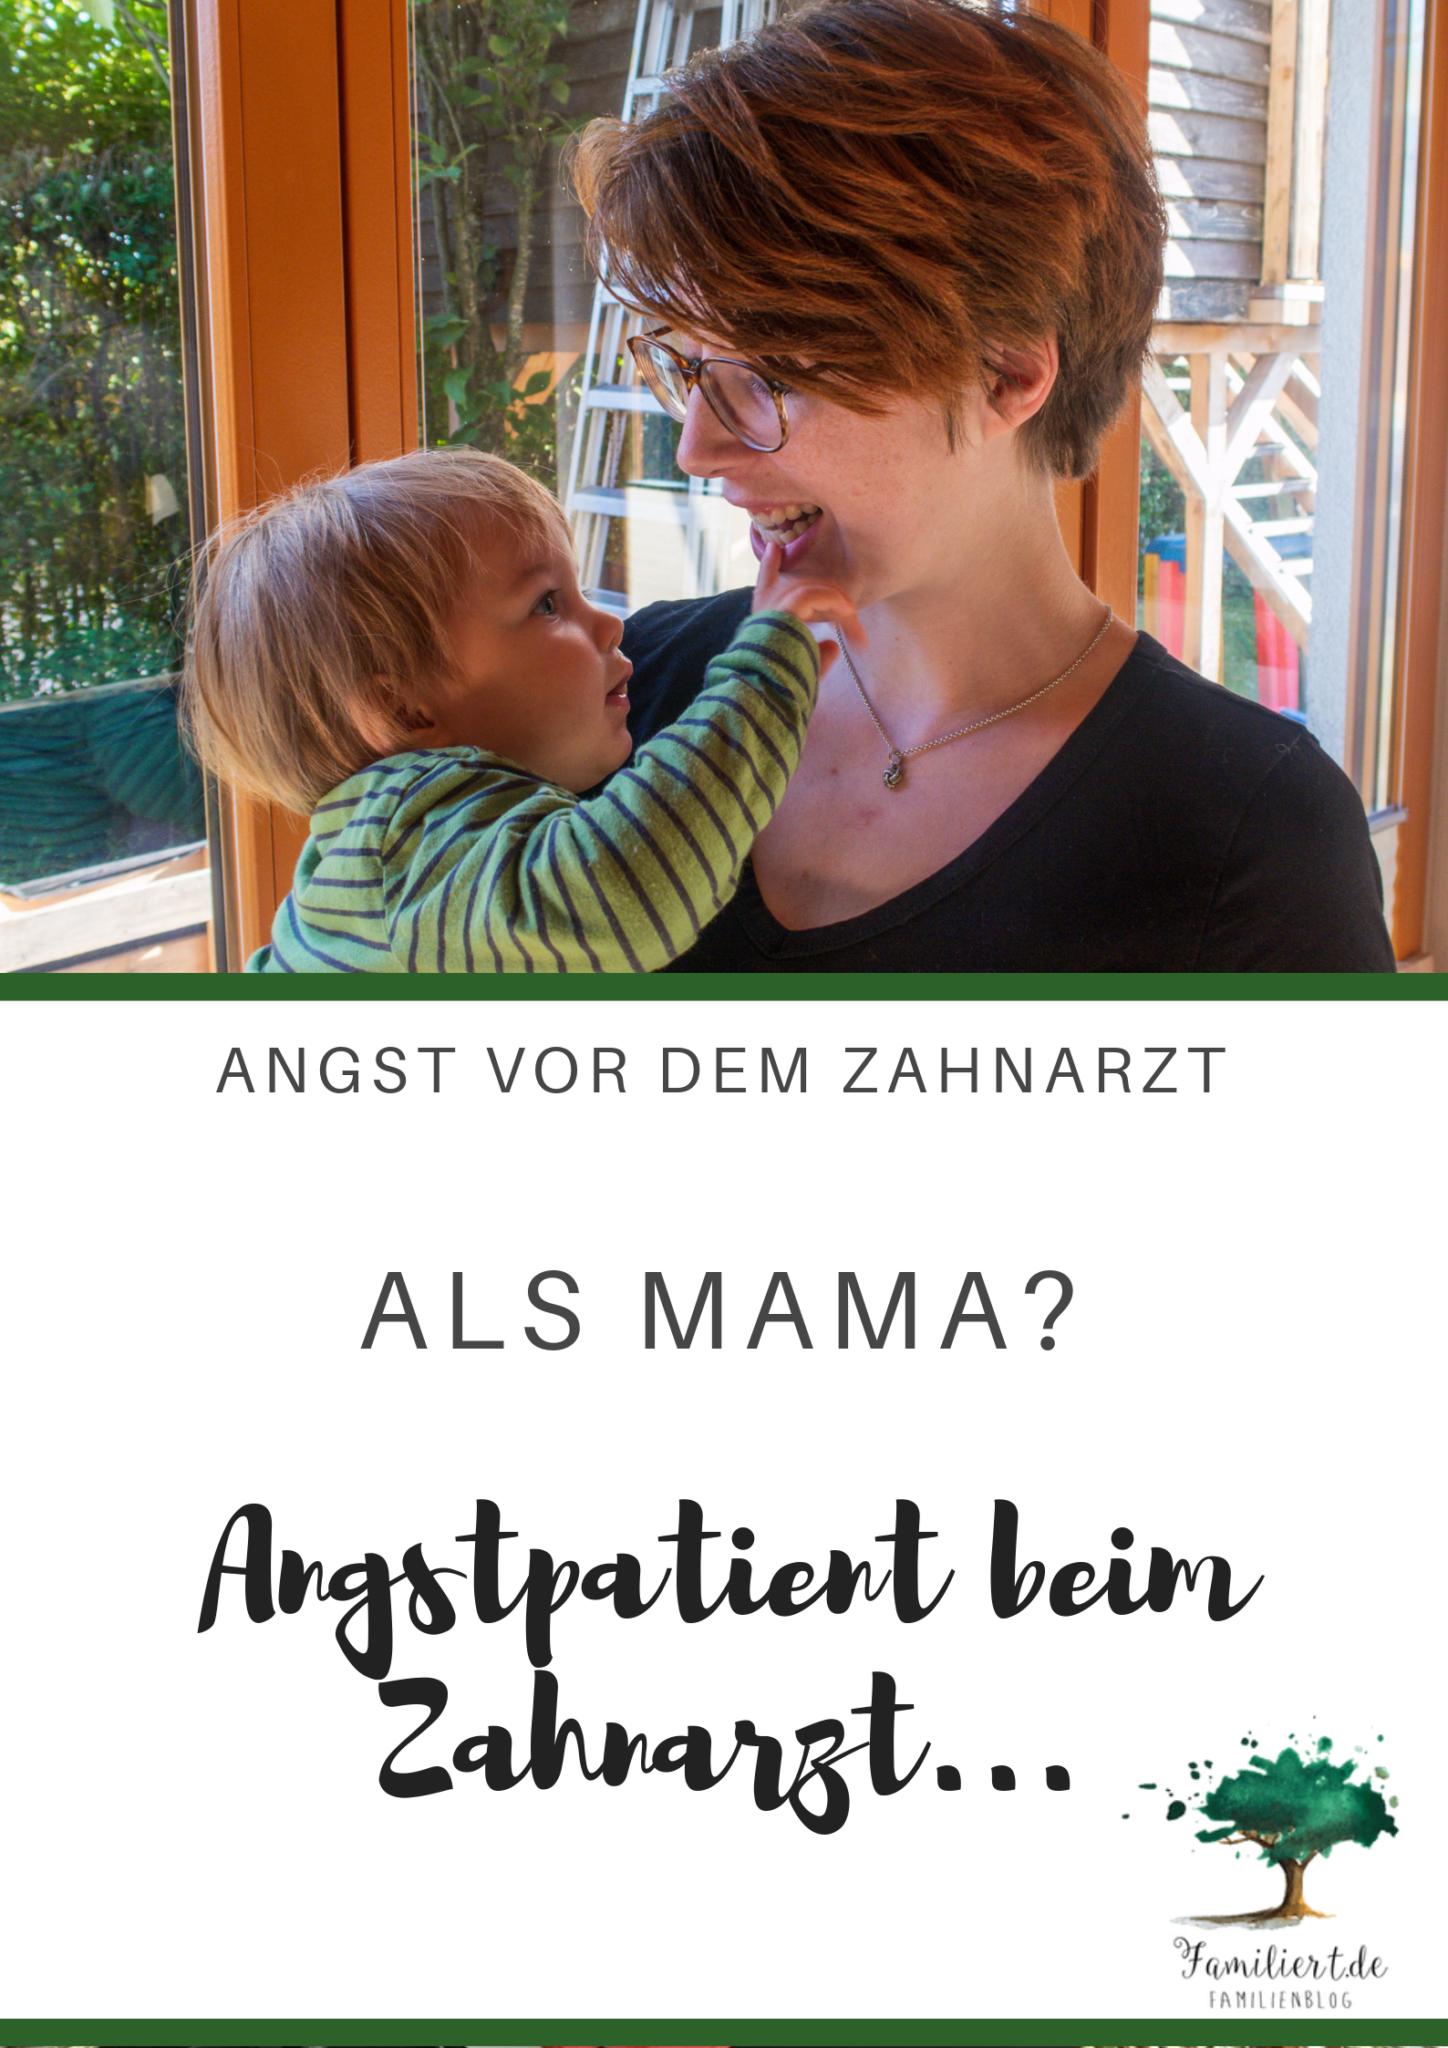 Als Mama panische Angst vor dem Zahnarzt - Angstpatient | familiert.de